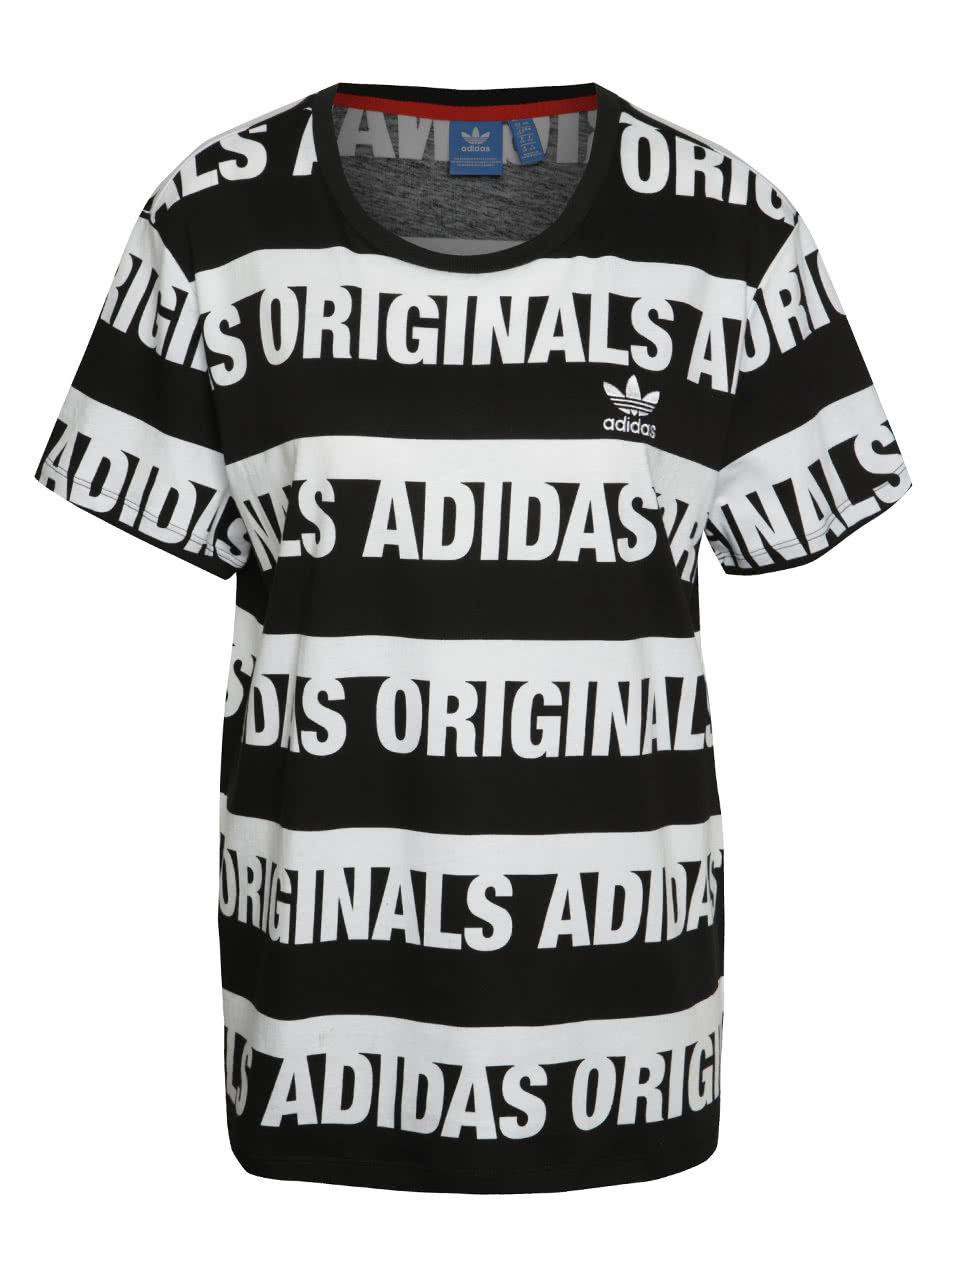 Bielo-čierne dámske tričko adidas Originals Trefoil ... 0480768200d